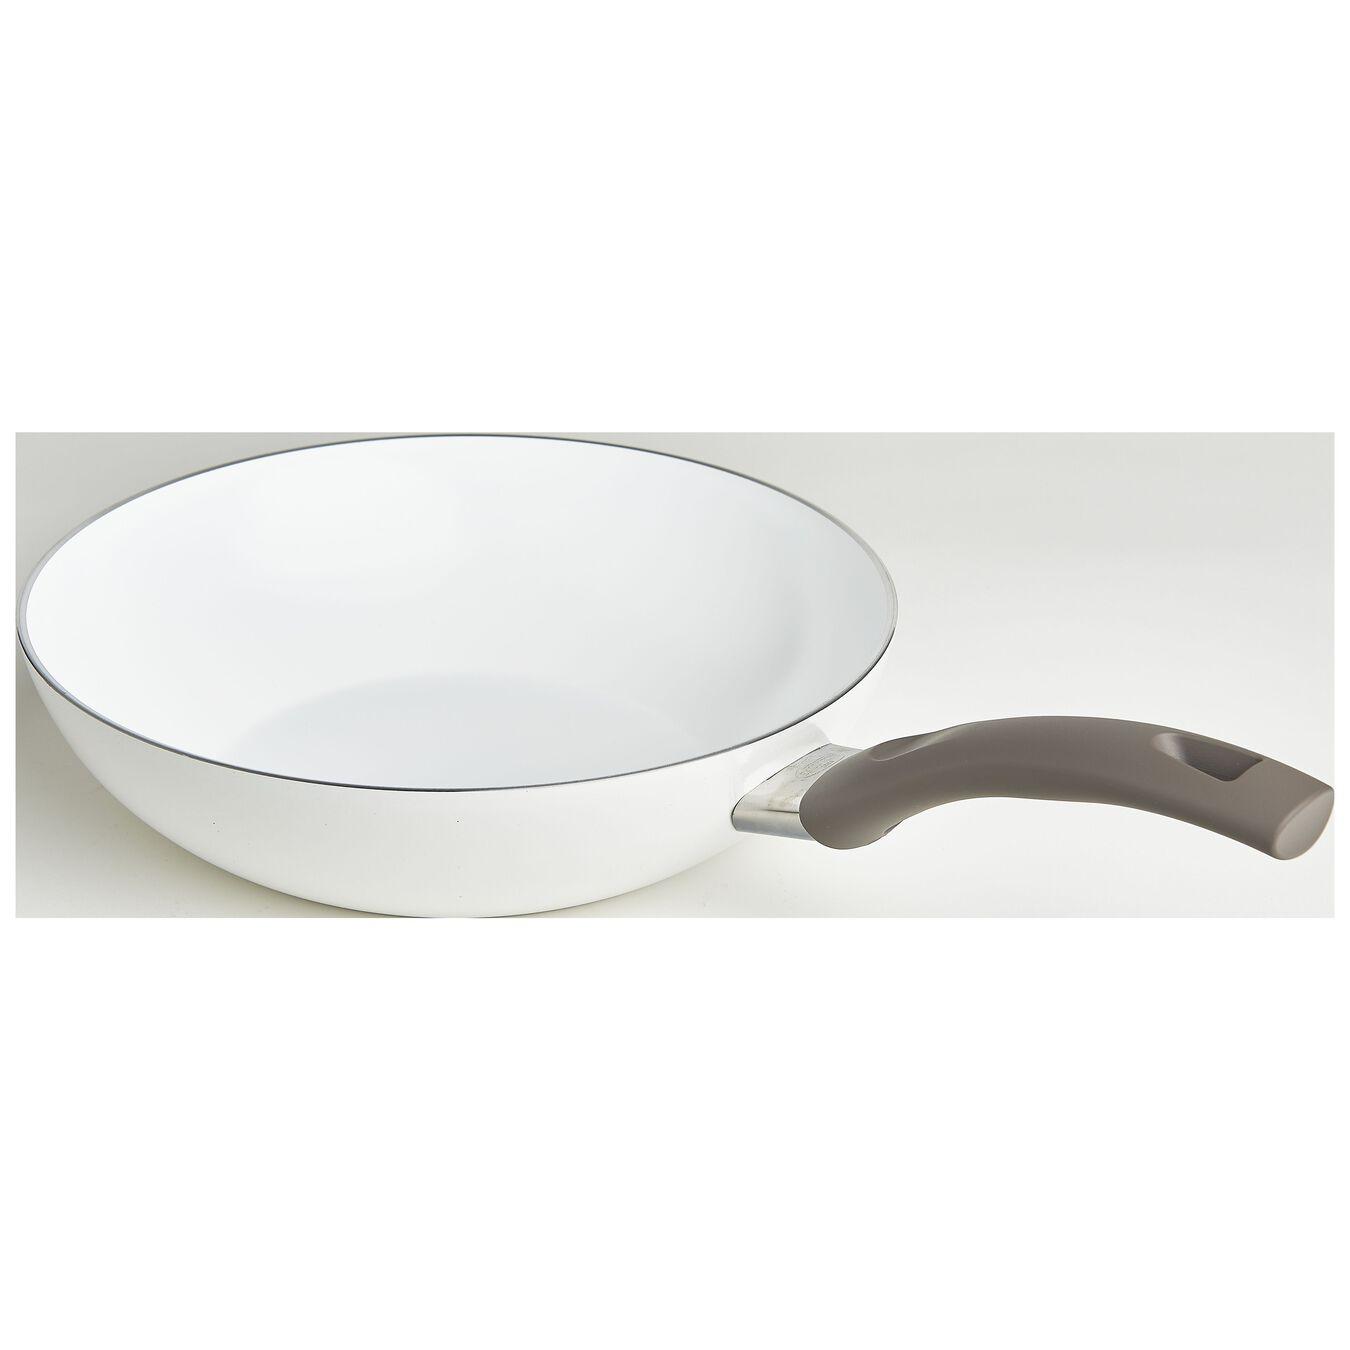 Wok/Gemüse/Pastapfanne 24 cm, Aluminium,,large 1